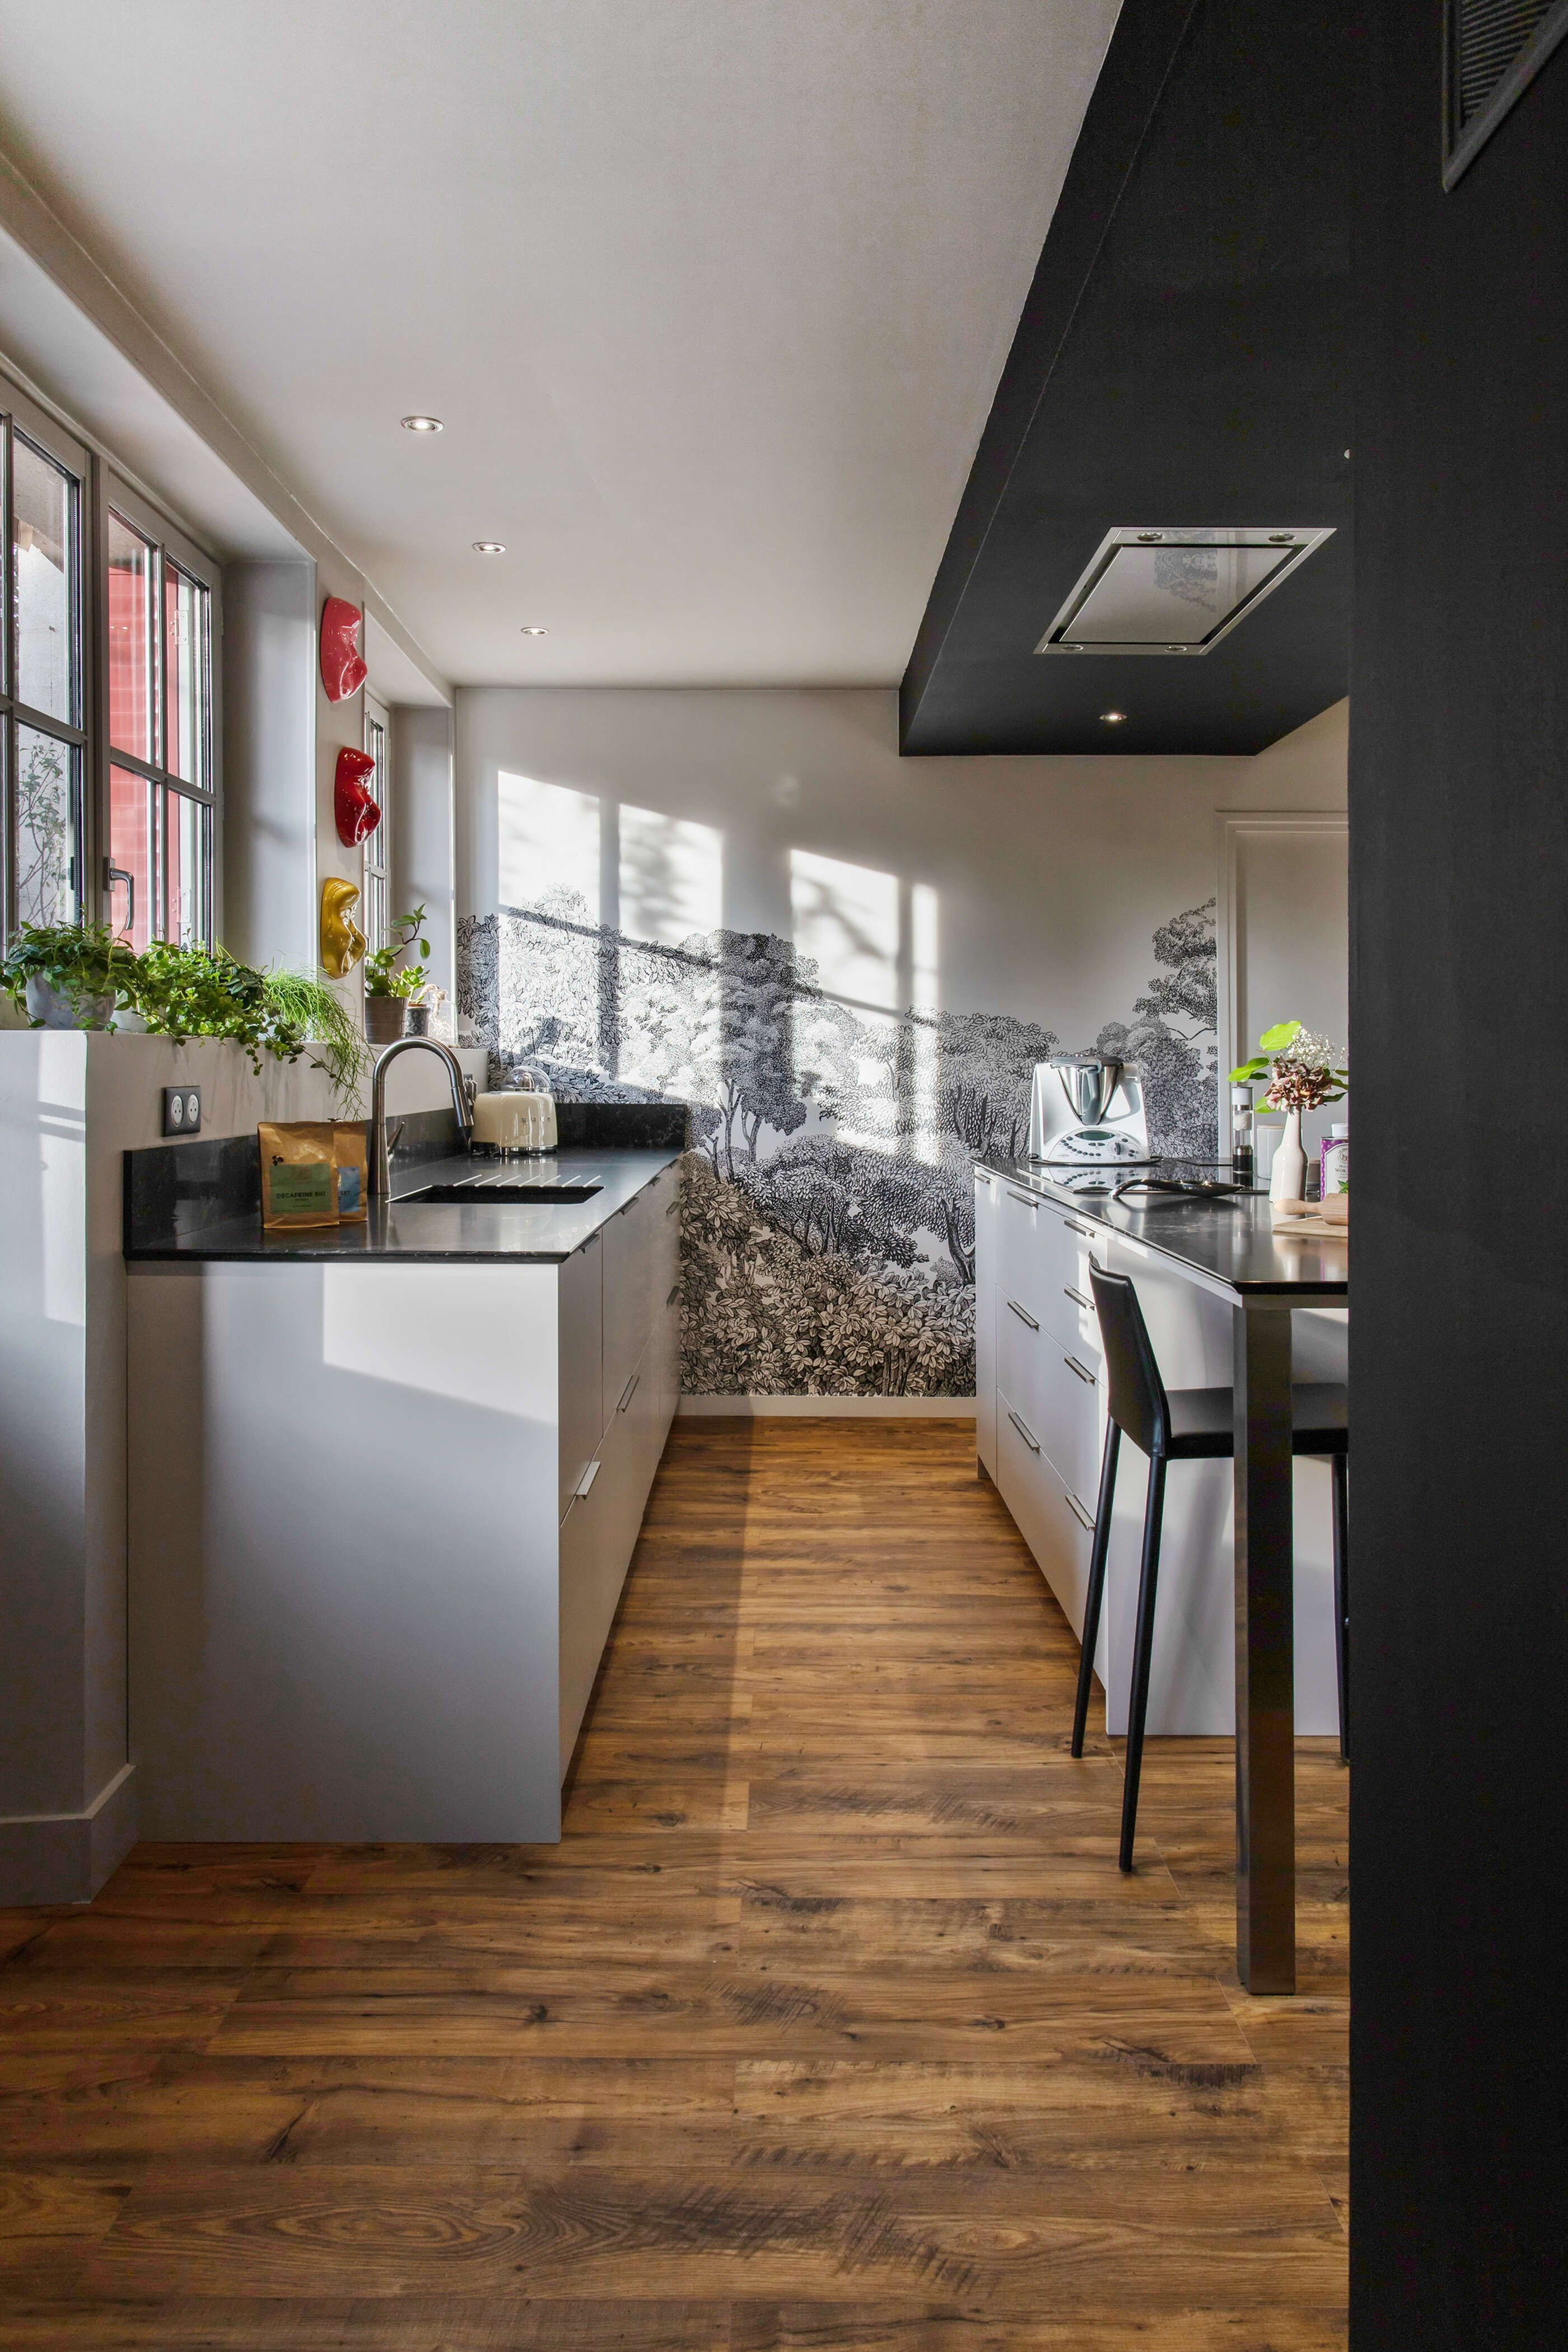 Perene Cuisines Salles De Bain Et Rangements Sur Mesure Cuisines Design Cuisine Moderne Cuisine Originale